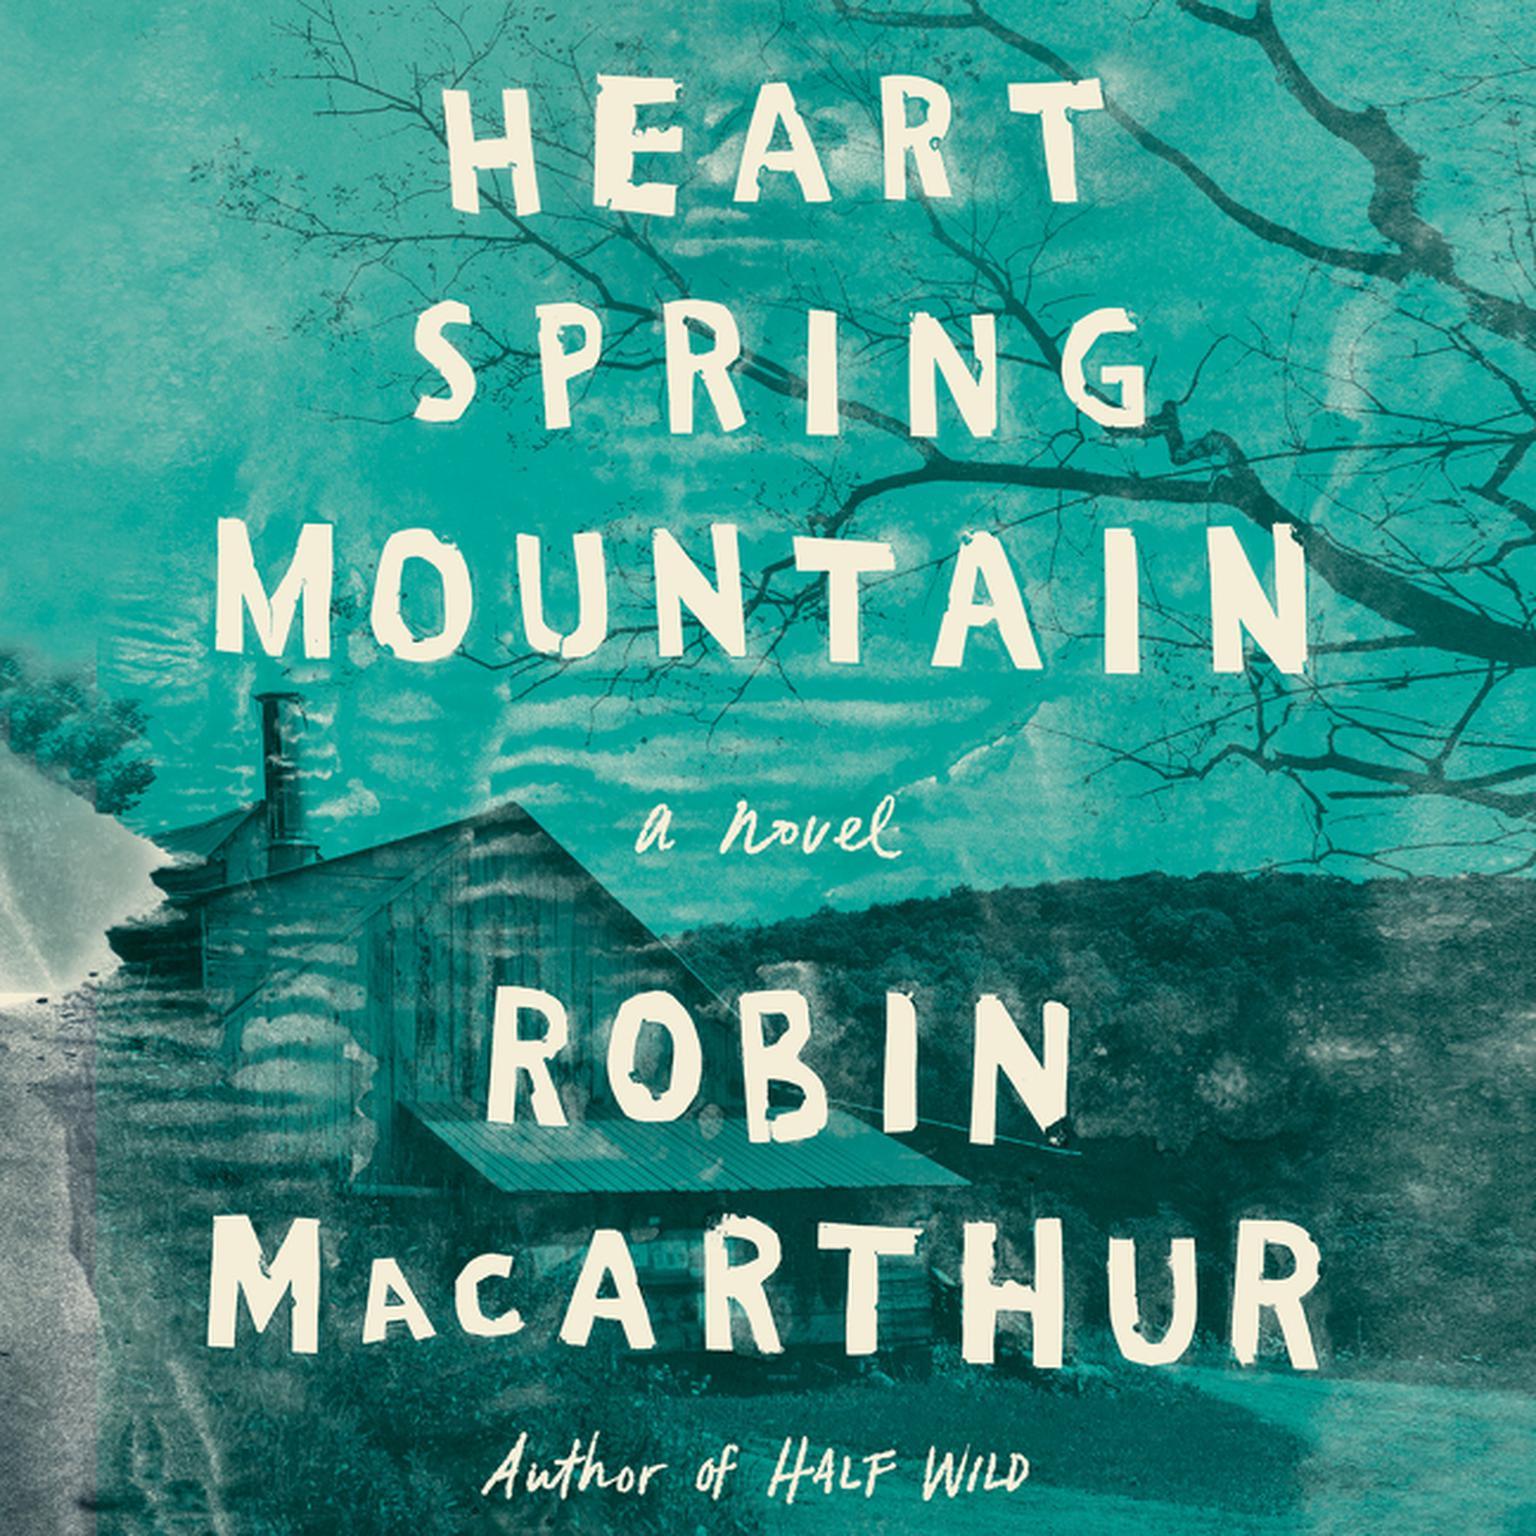 Heart Spring Mountain: A Novel Audiobook, by Robin MacArthur